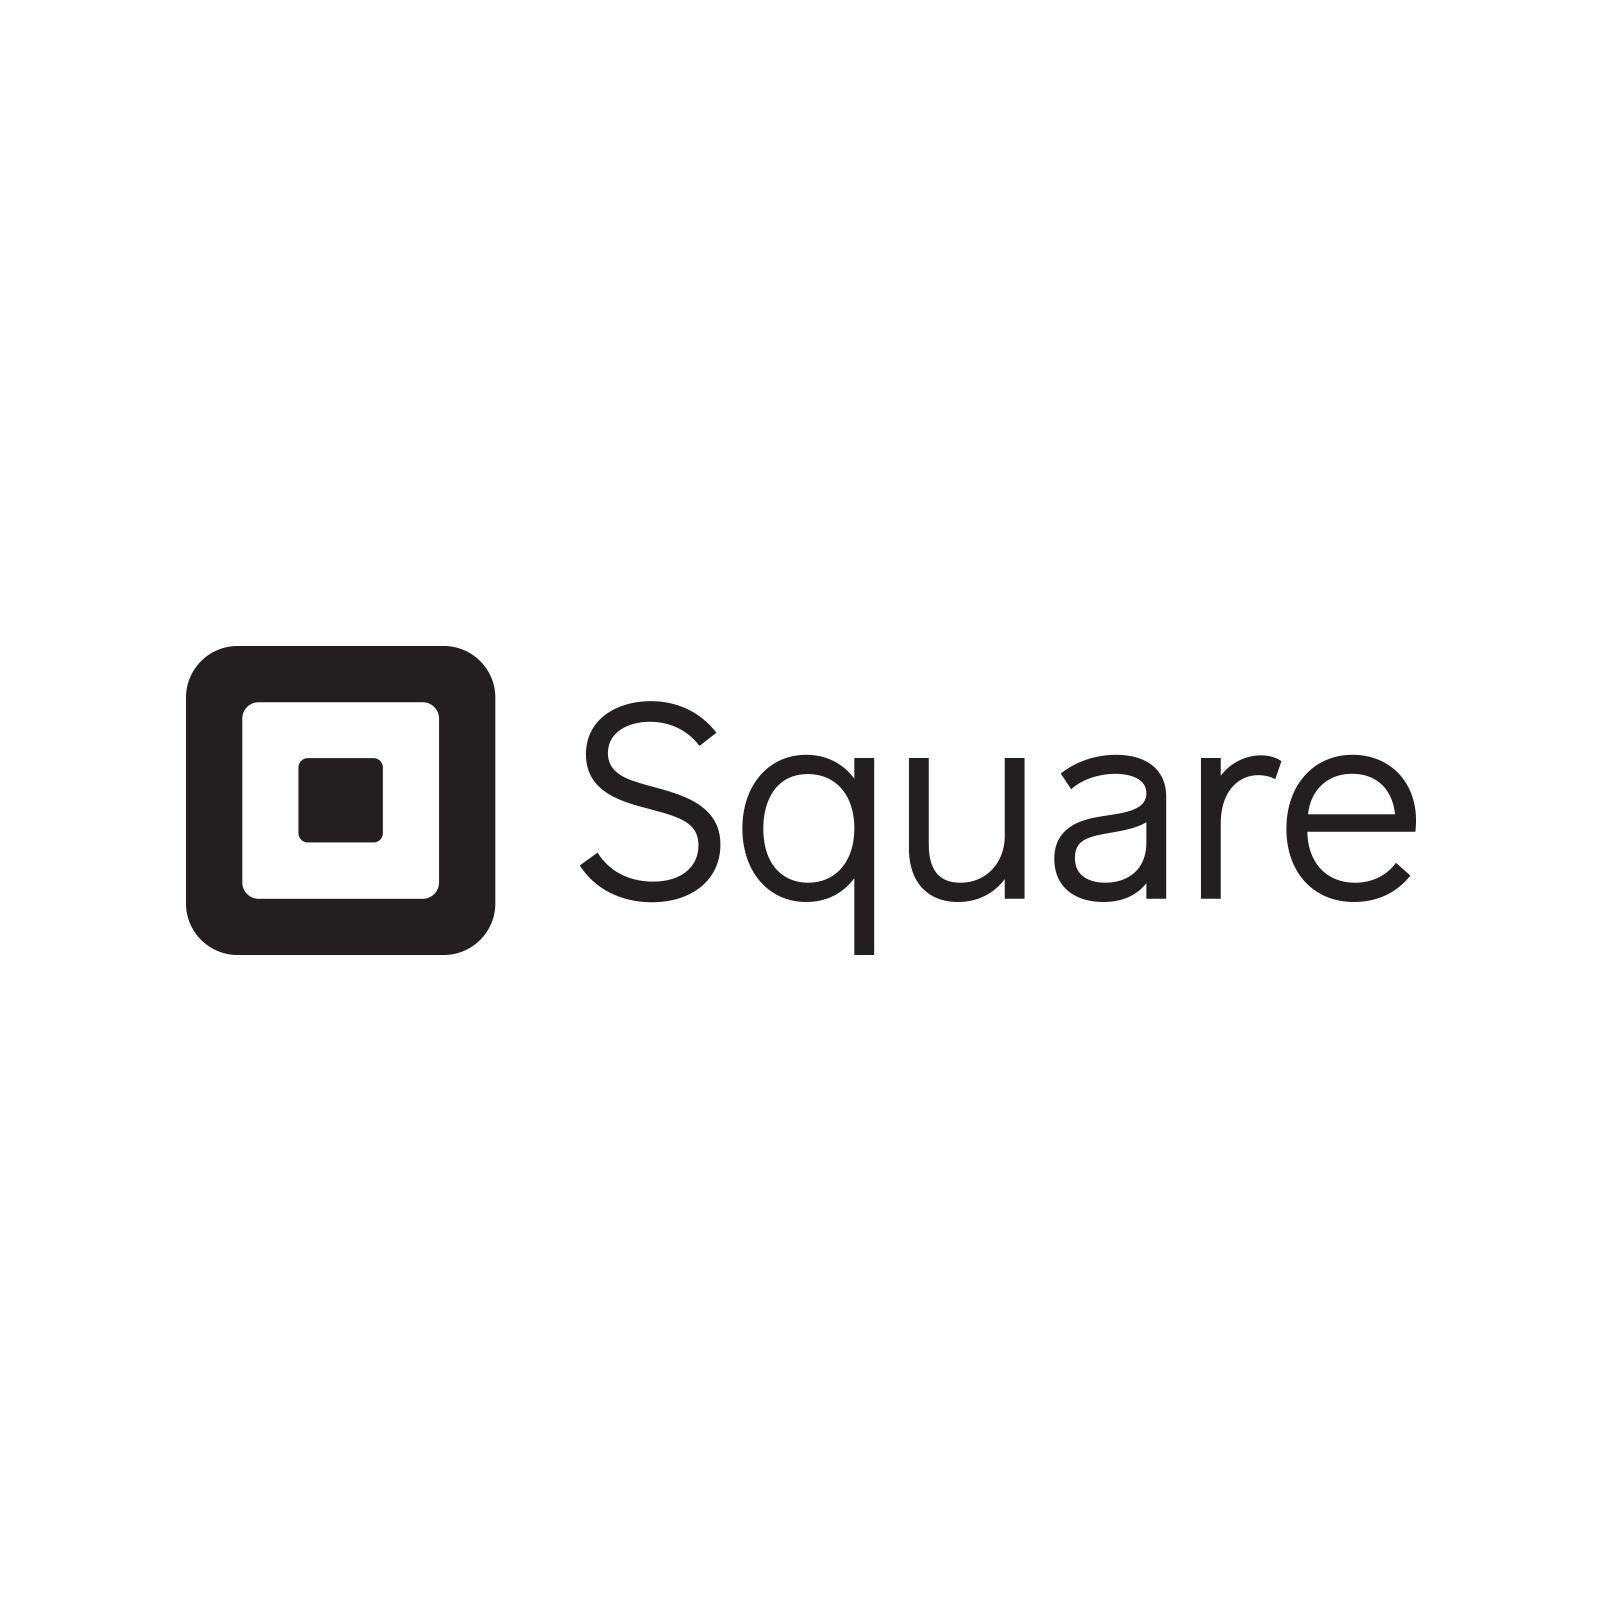 Square Management Team Up